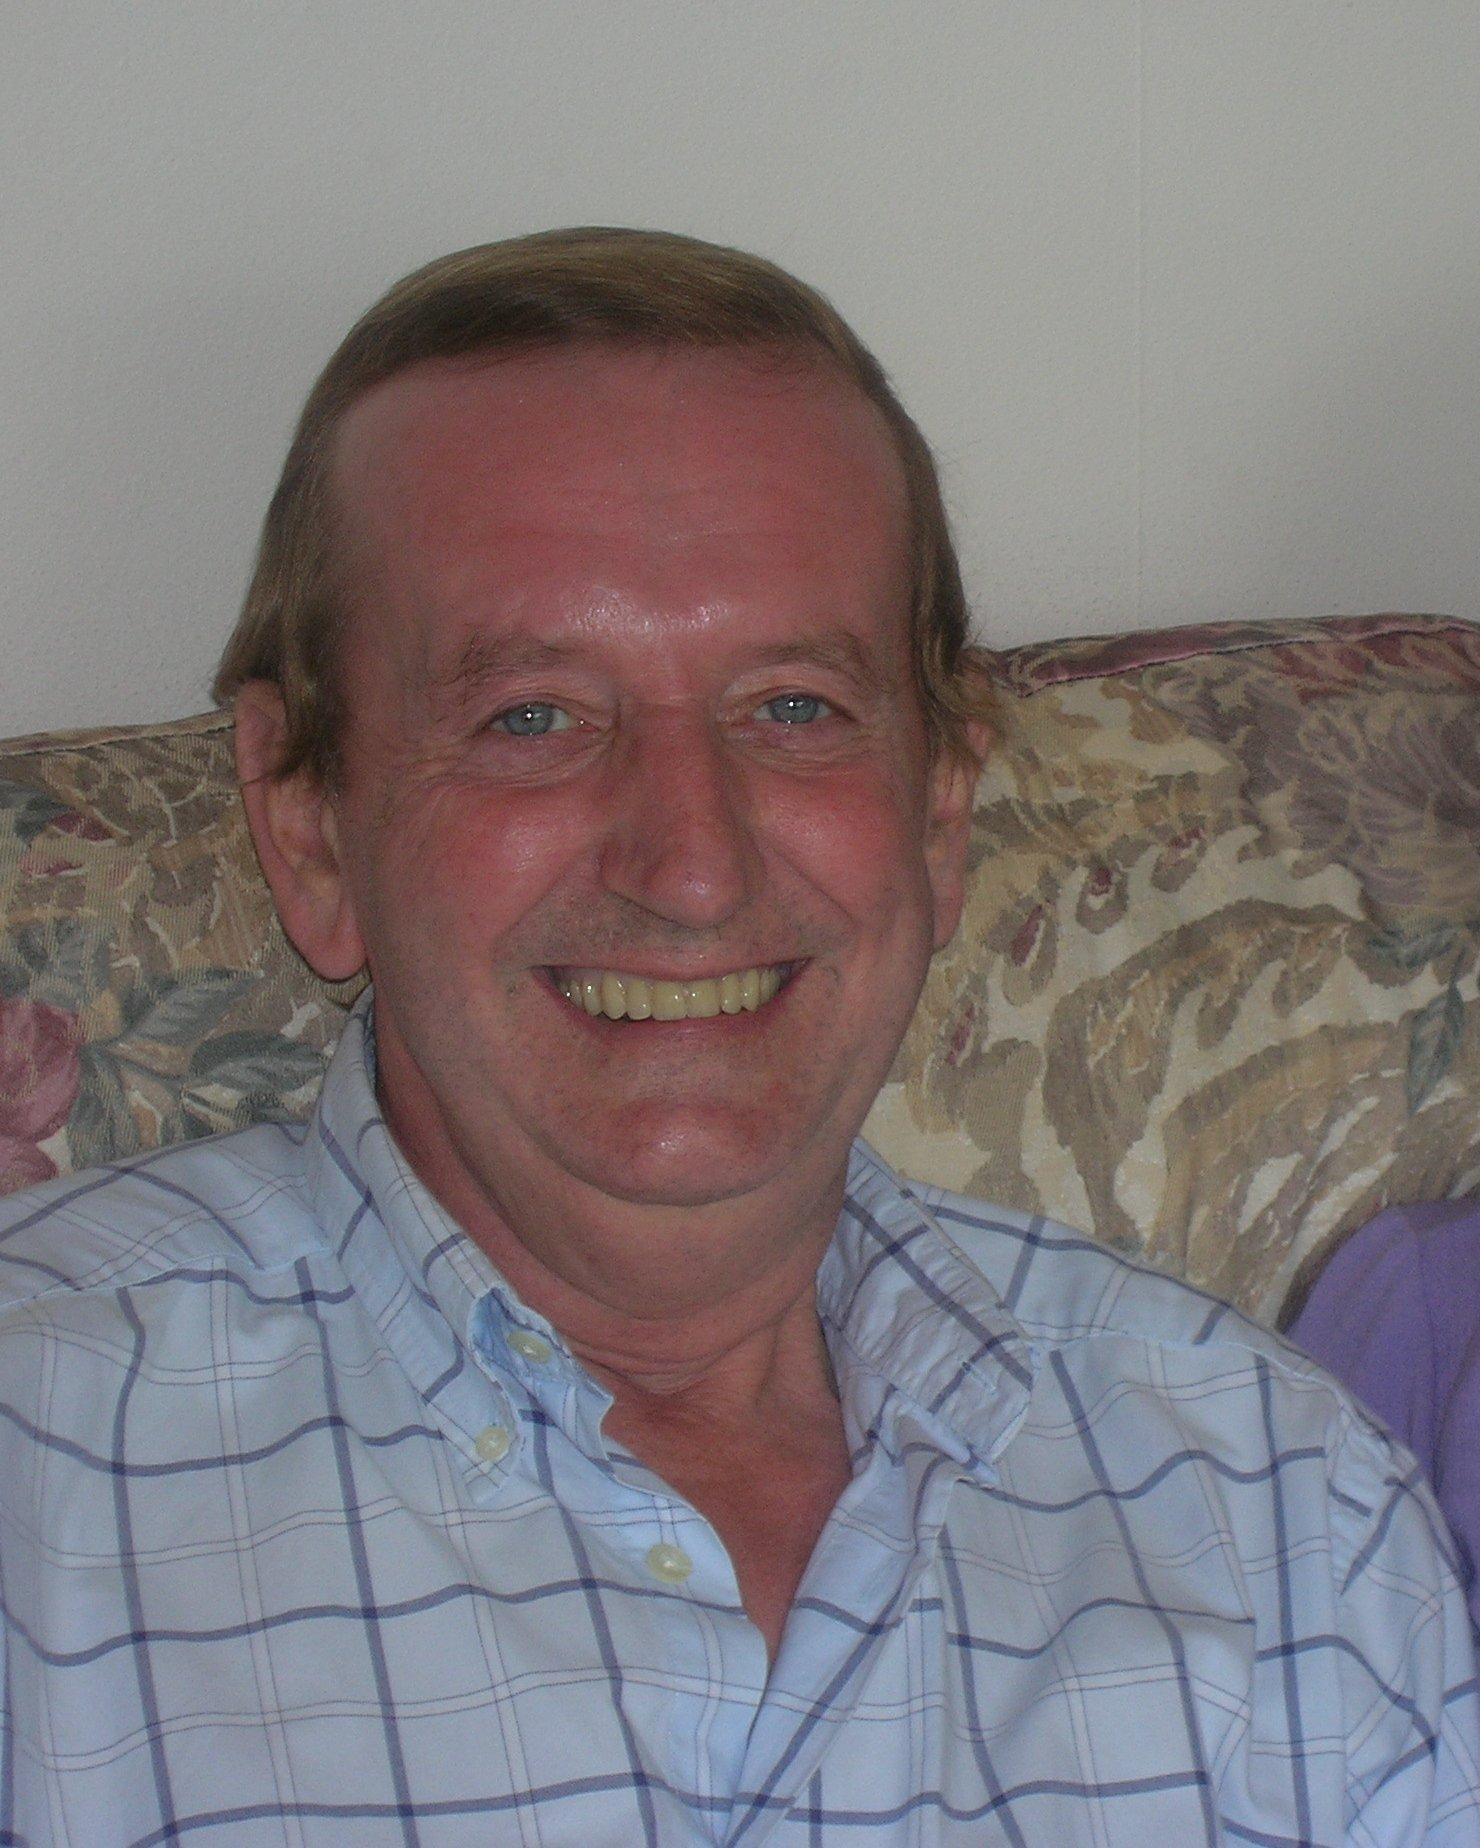 Eric Padley